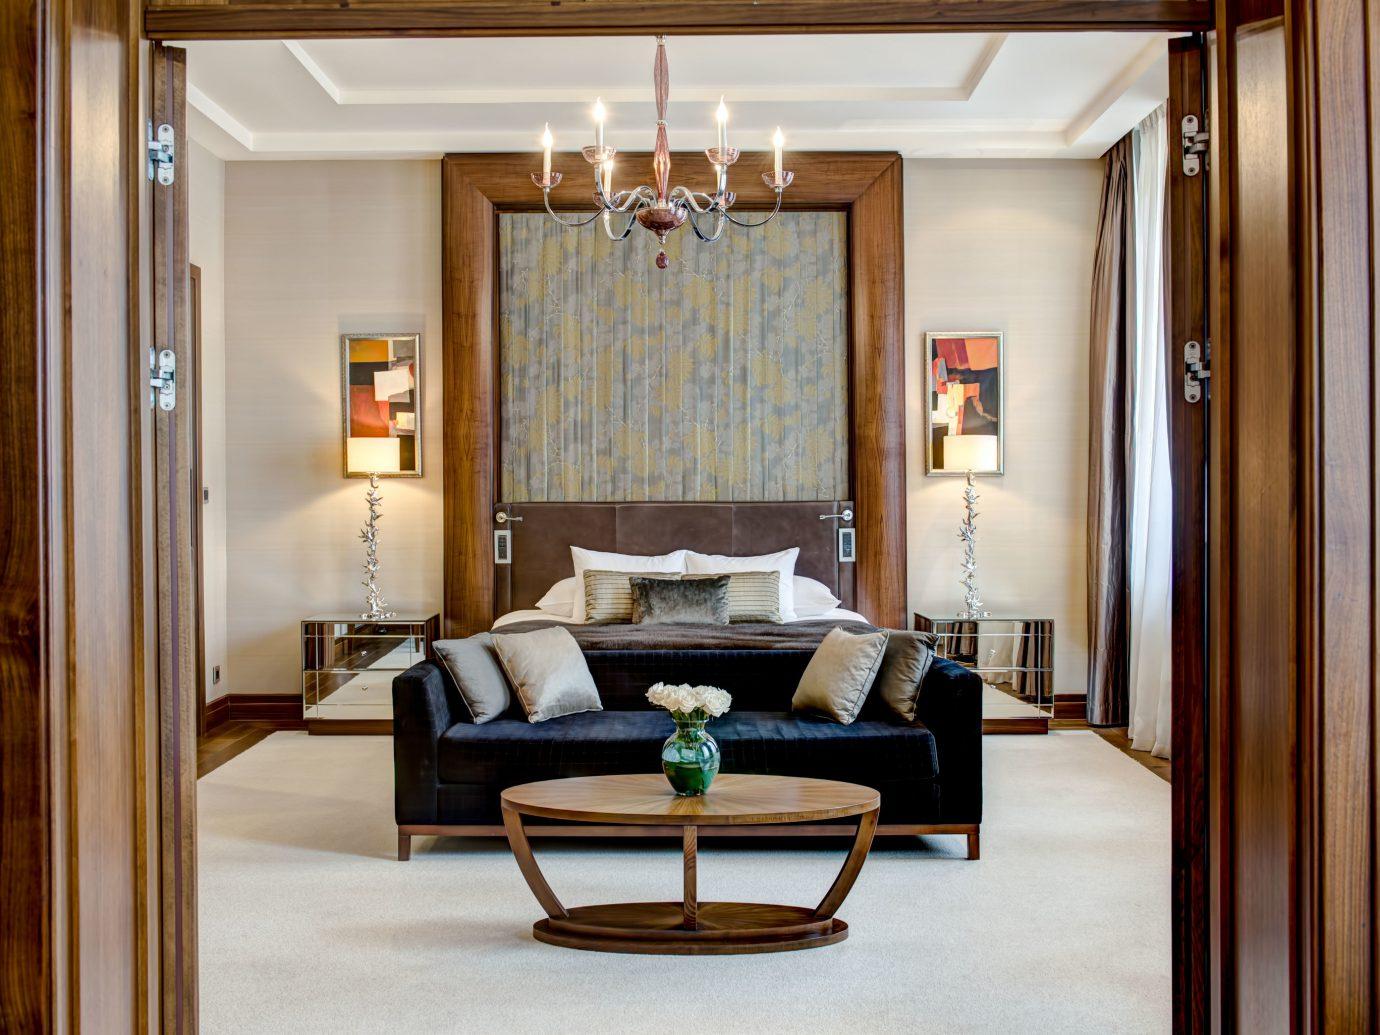 Hotels Luxury Travel indoor floor room living room interior design Living ceiling Suite Lobby furniture table dining room interior designer window hardwood window treatment